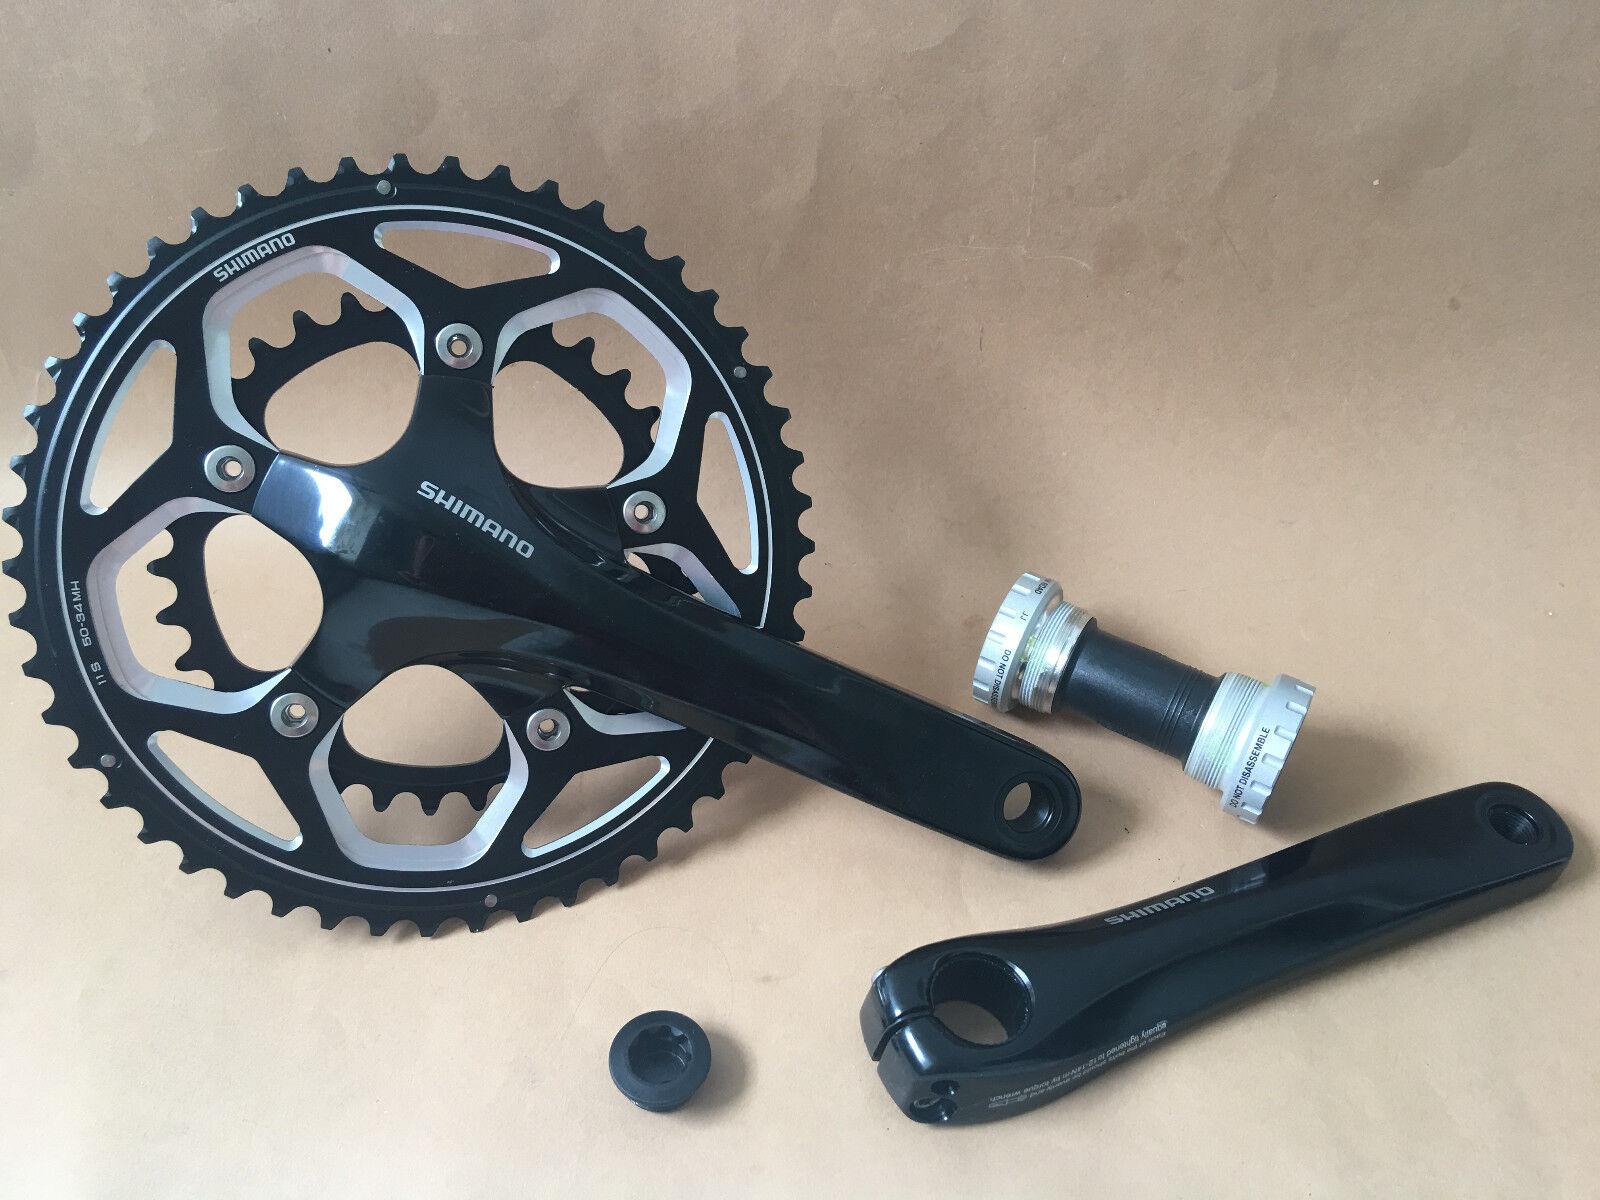 Shimano Kurbelgarnitur FC-RS500 2x11 Fach 50 34 Z 172,5  Mit Lager black Neu